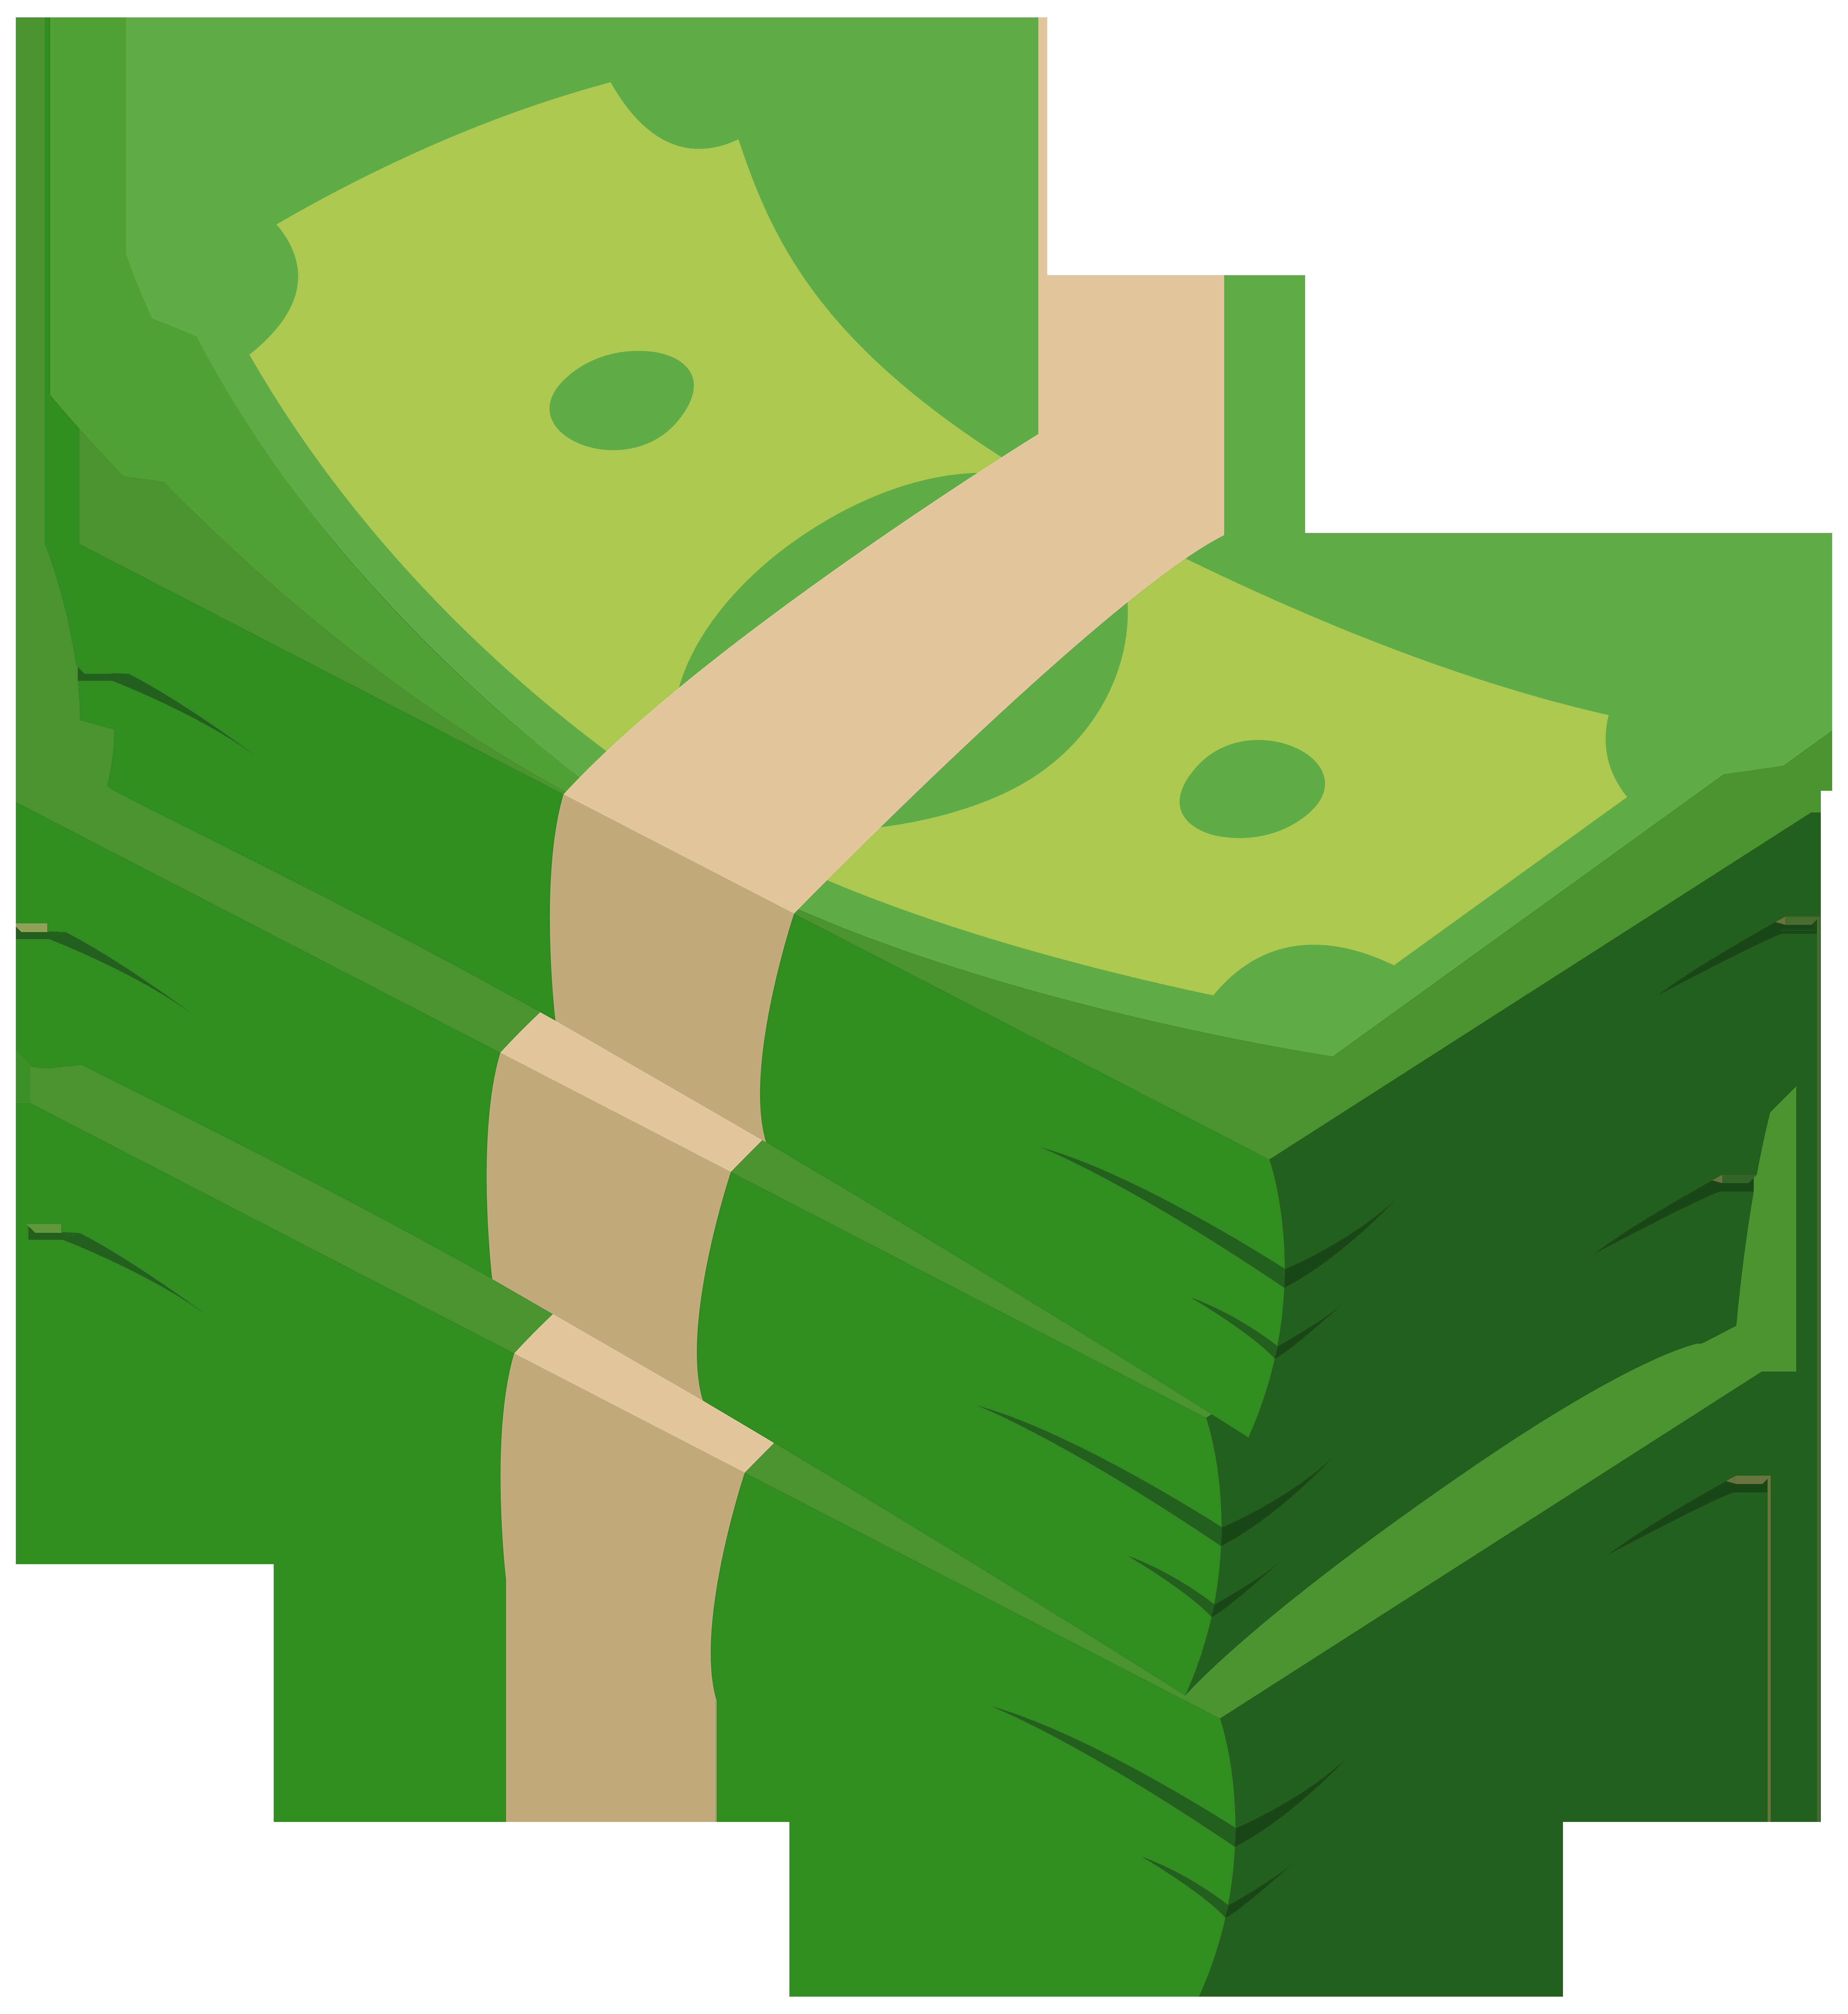 Illustration transparent clip art. Money image png